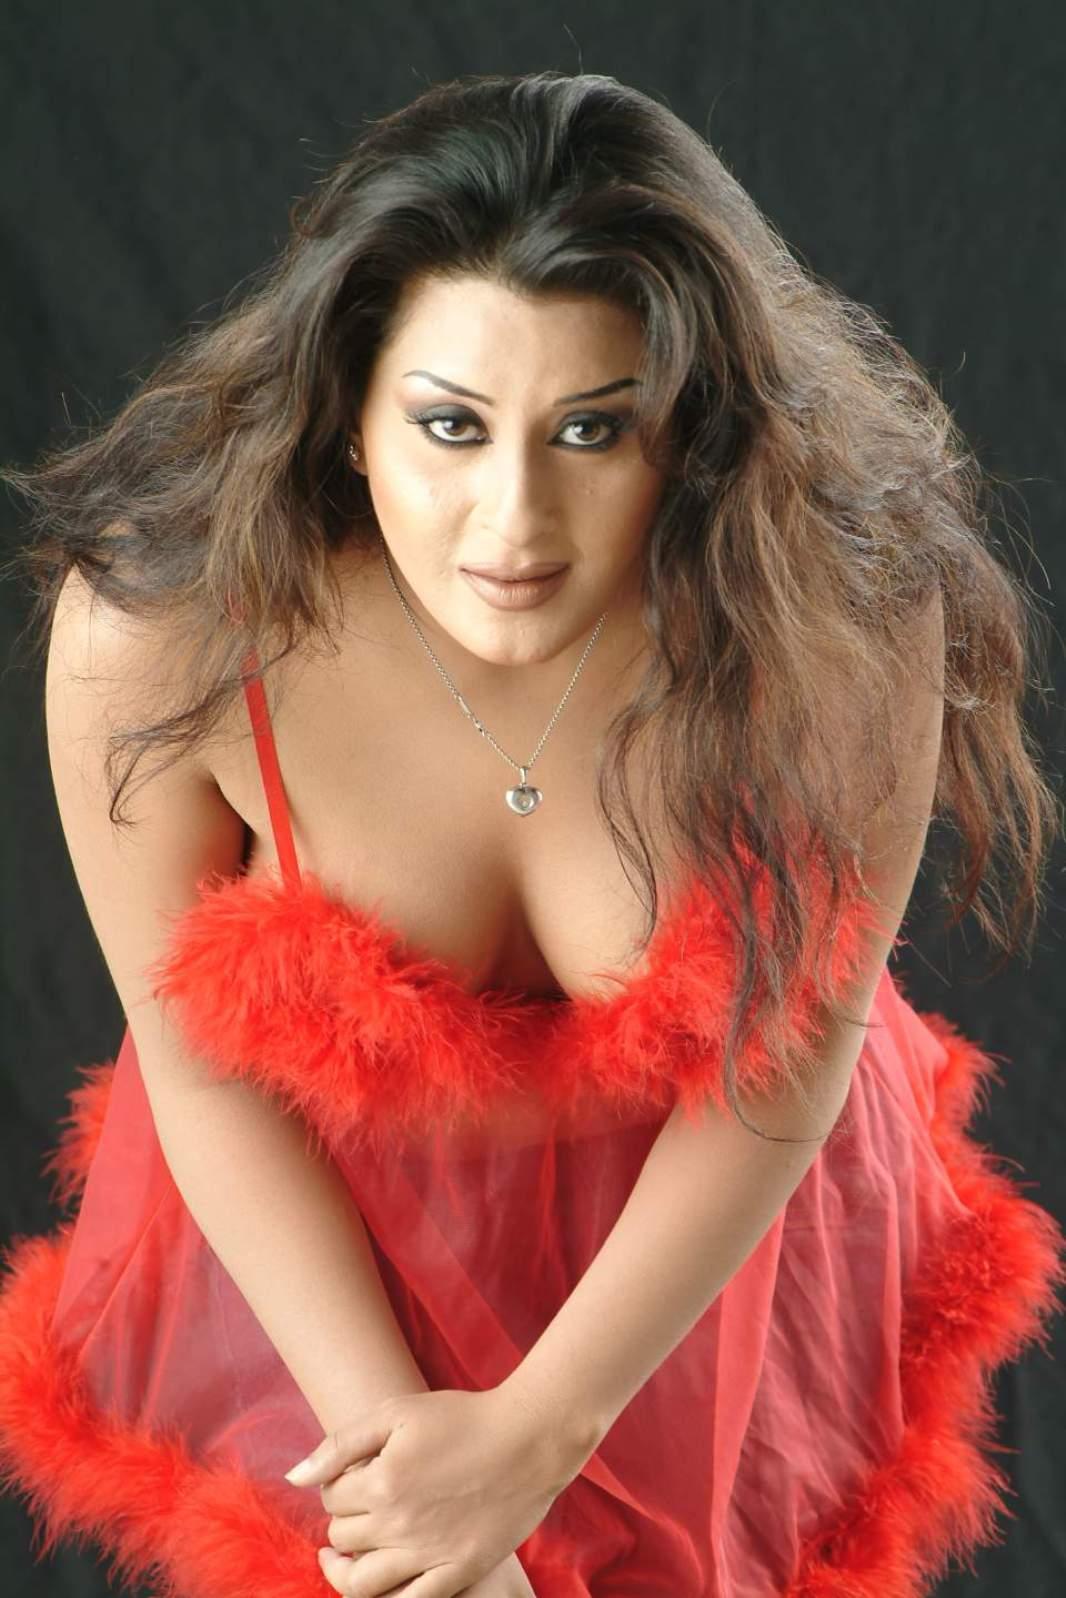 pakistani actress laila hot pics check out her